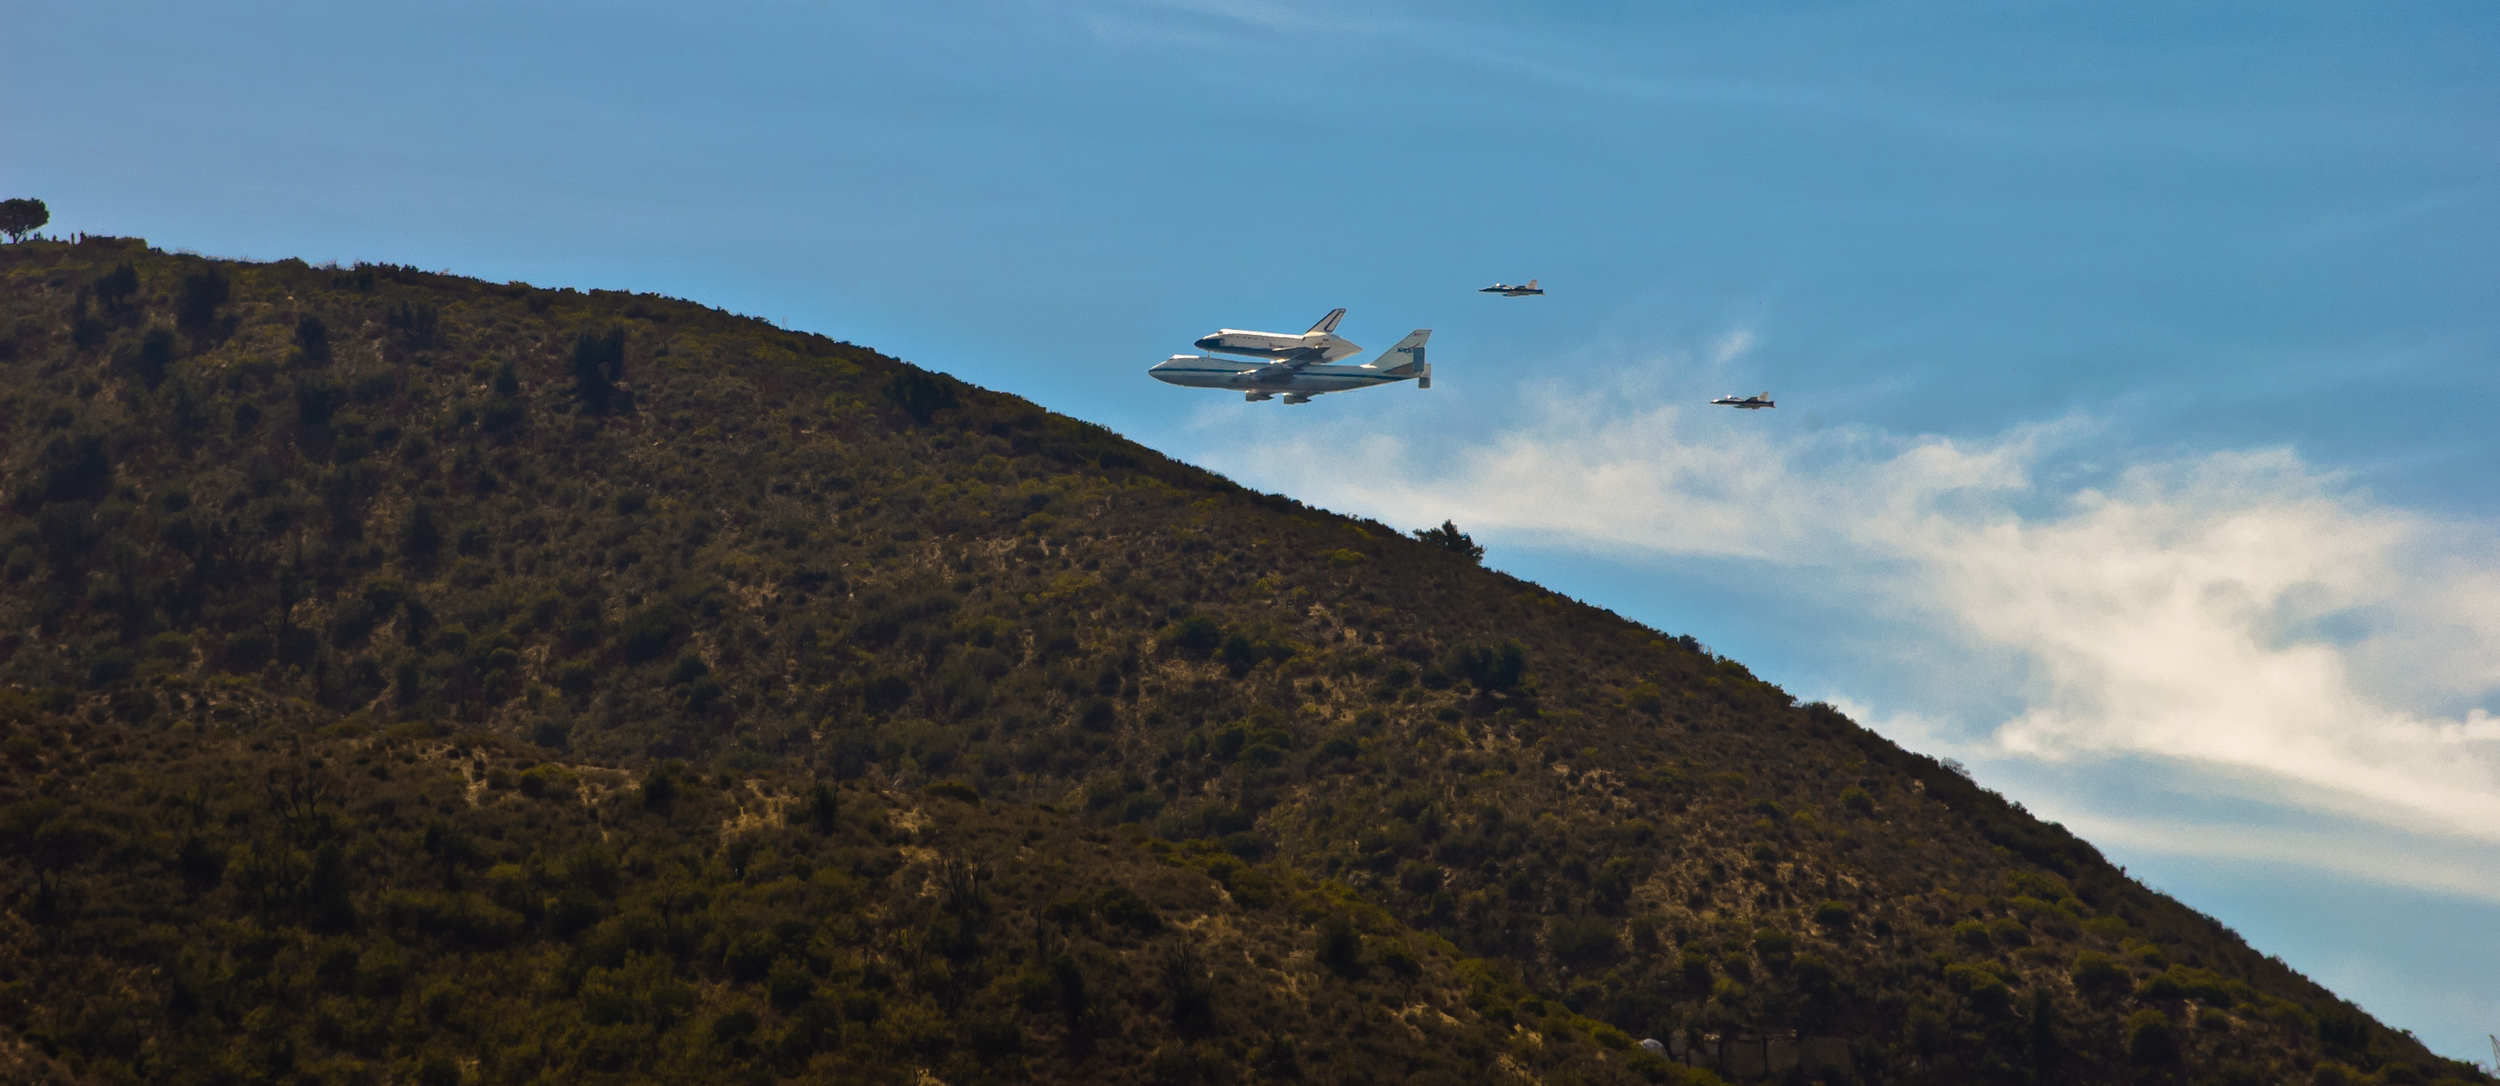 Endeavor over LA-20120921047-009.jpg